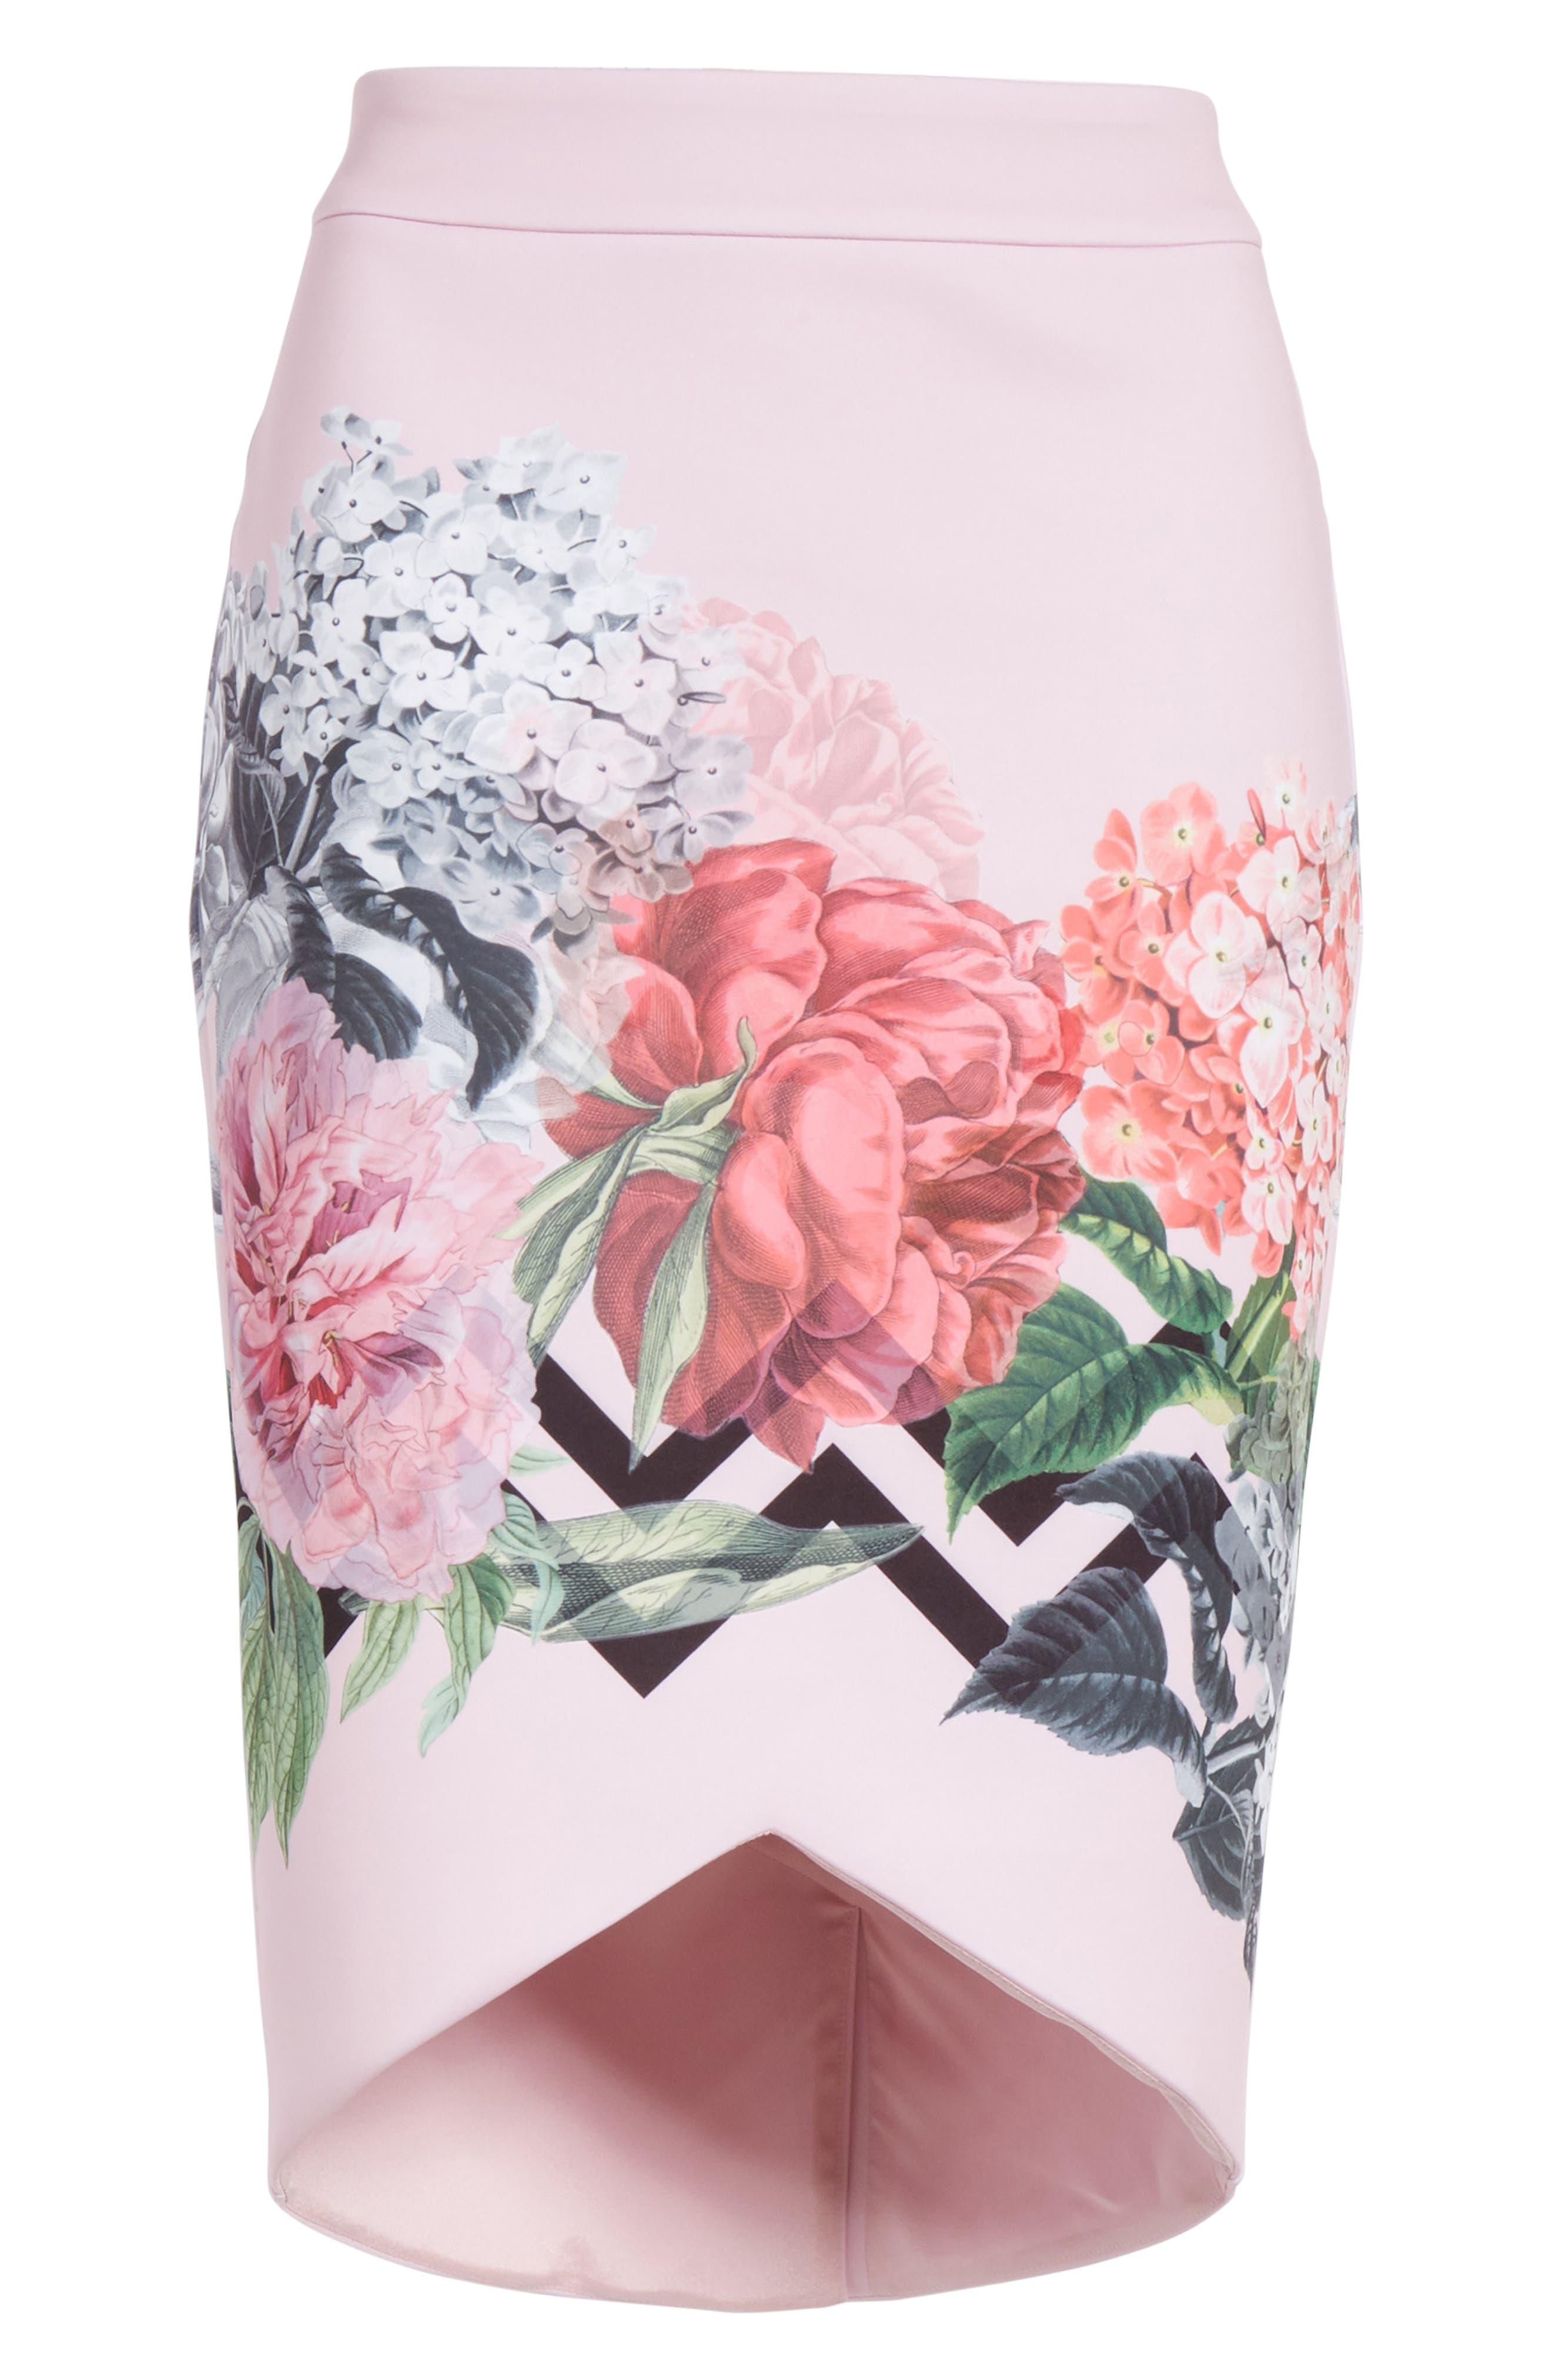 Soella Pencil Skirt,                             Alternate thumbnail 6, color,                             680